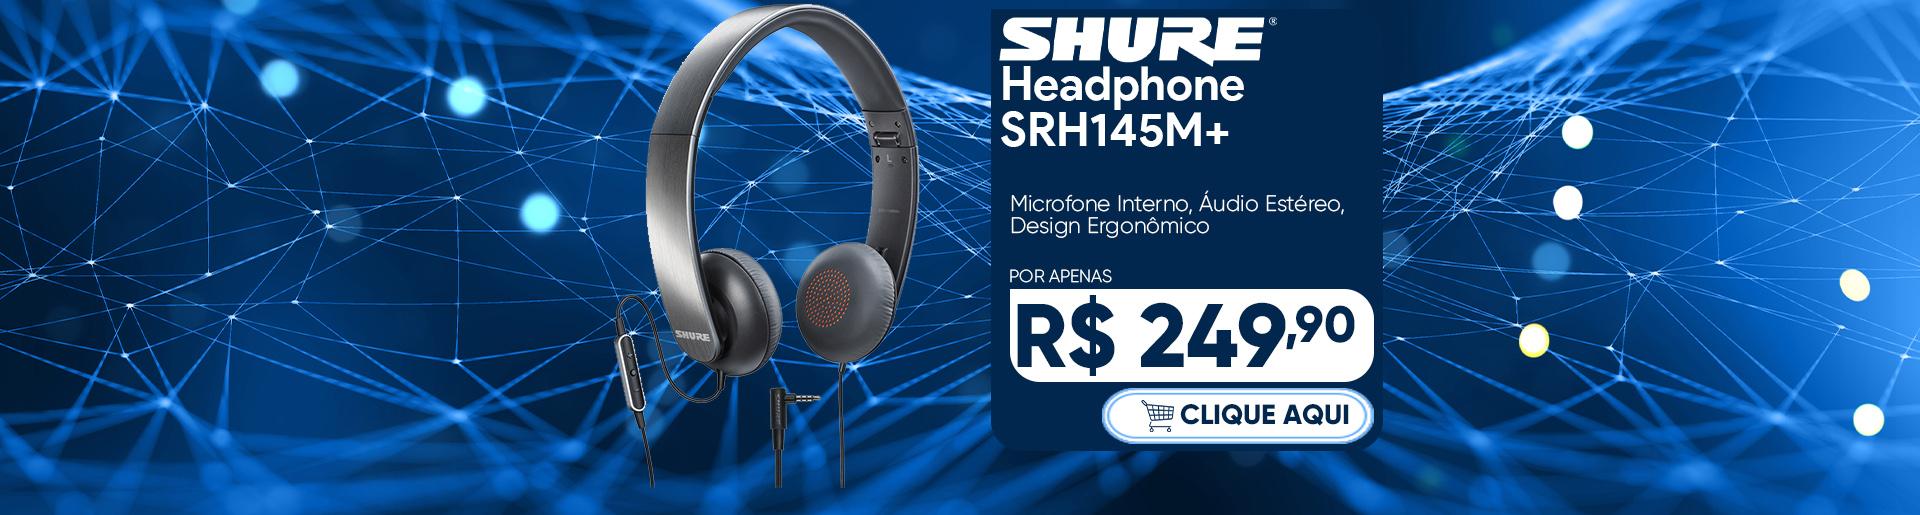 Headphone Shure